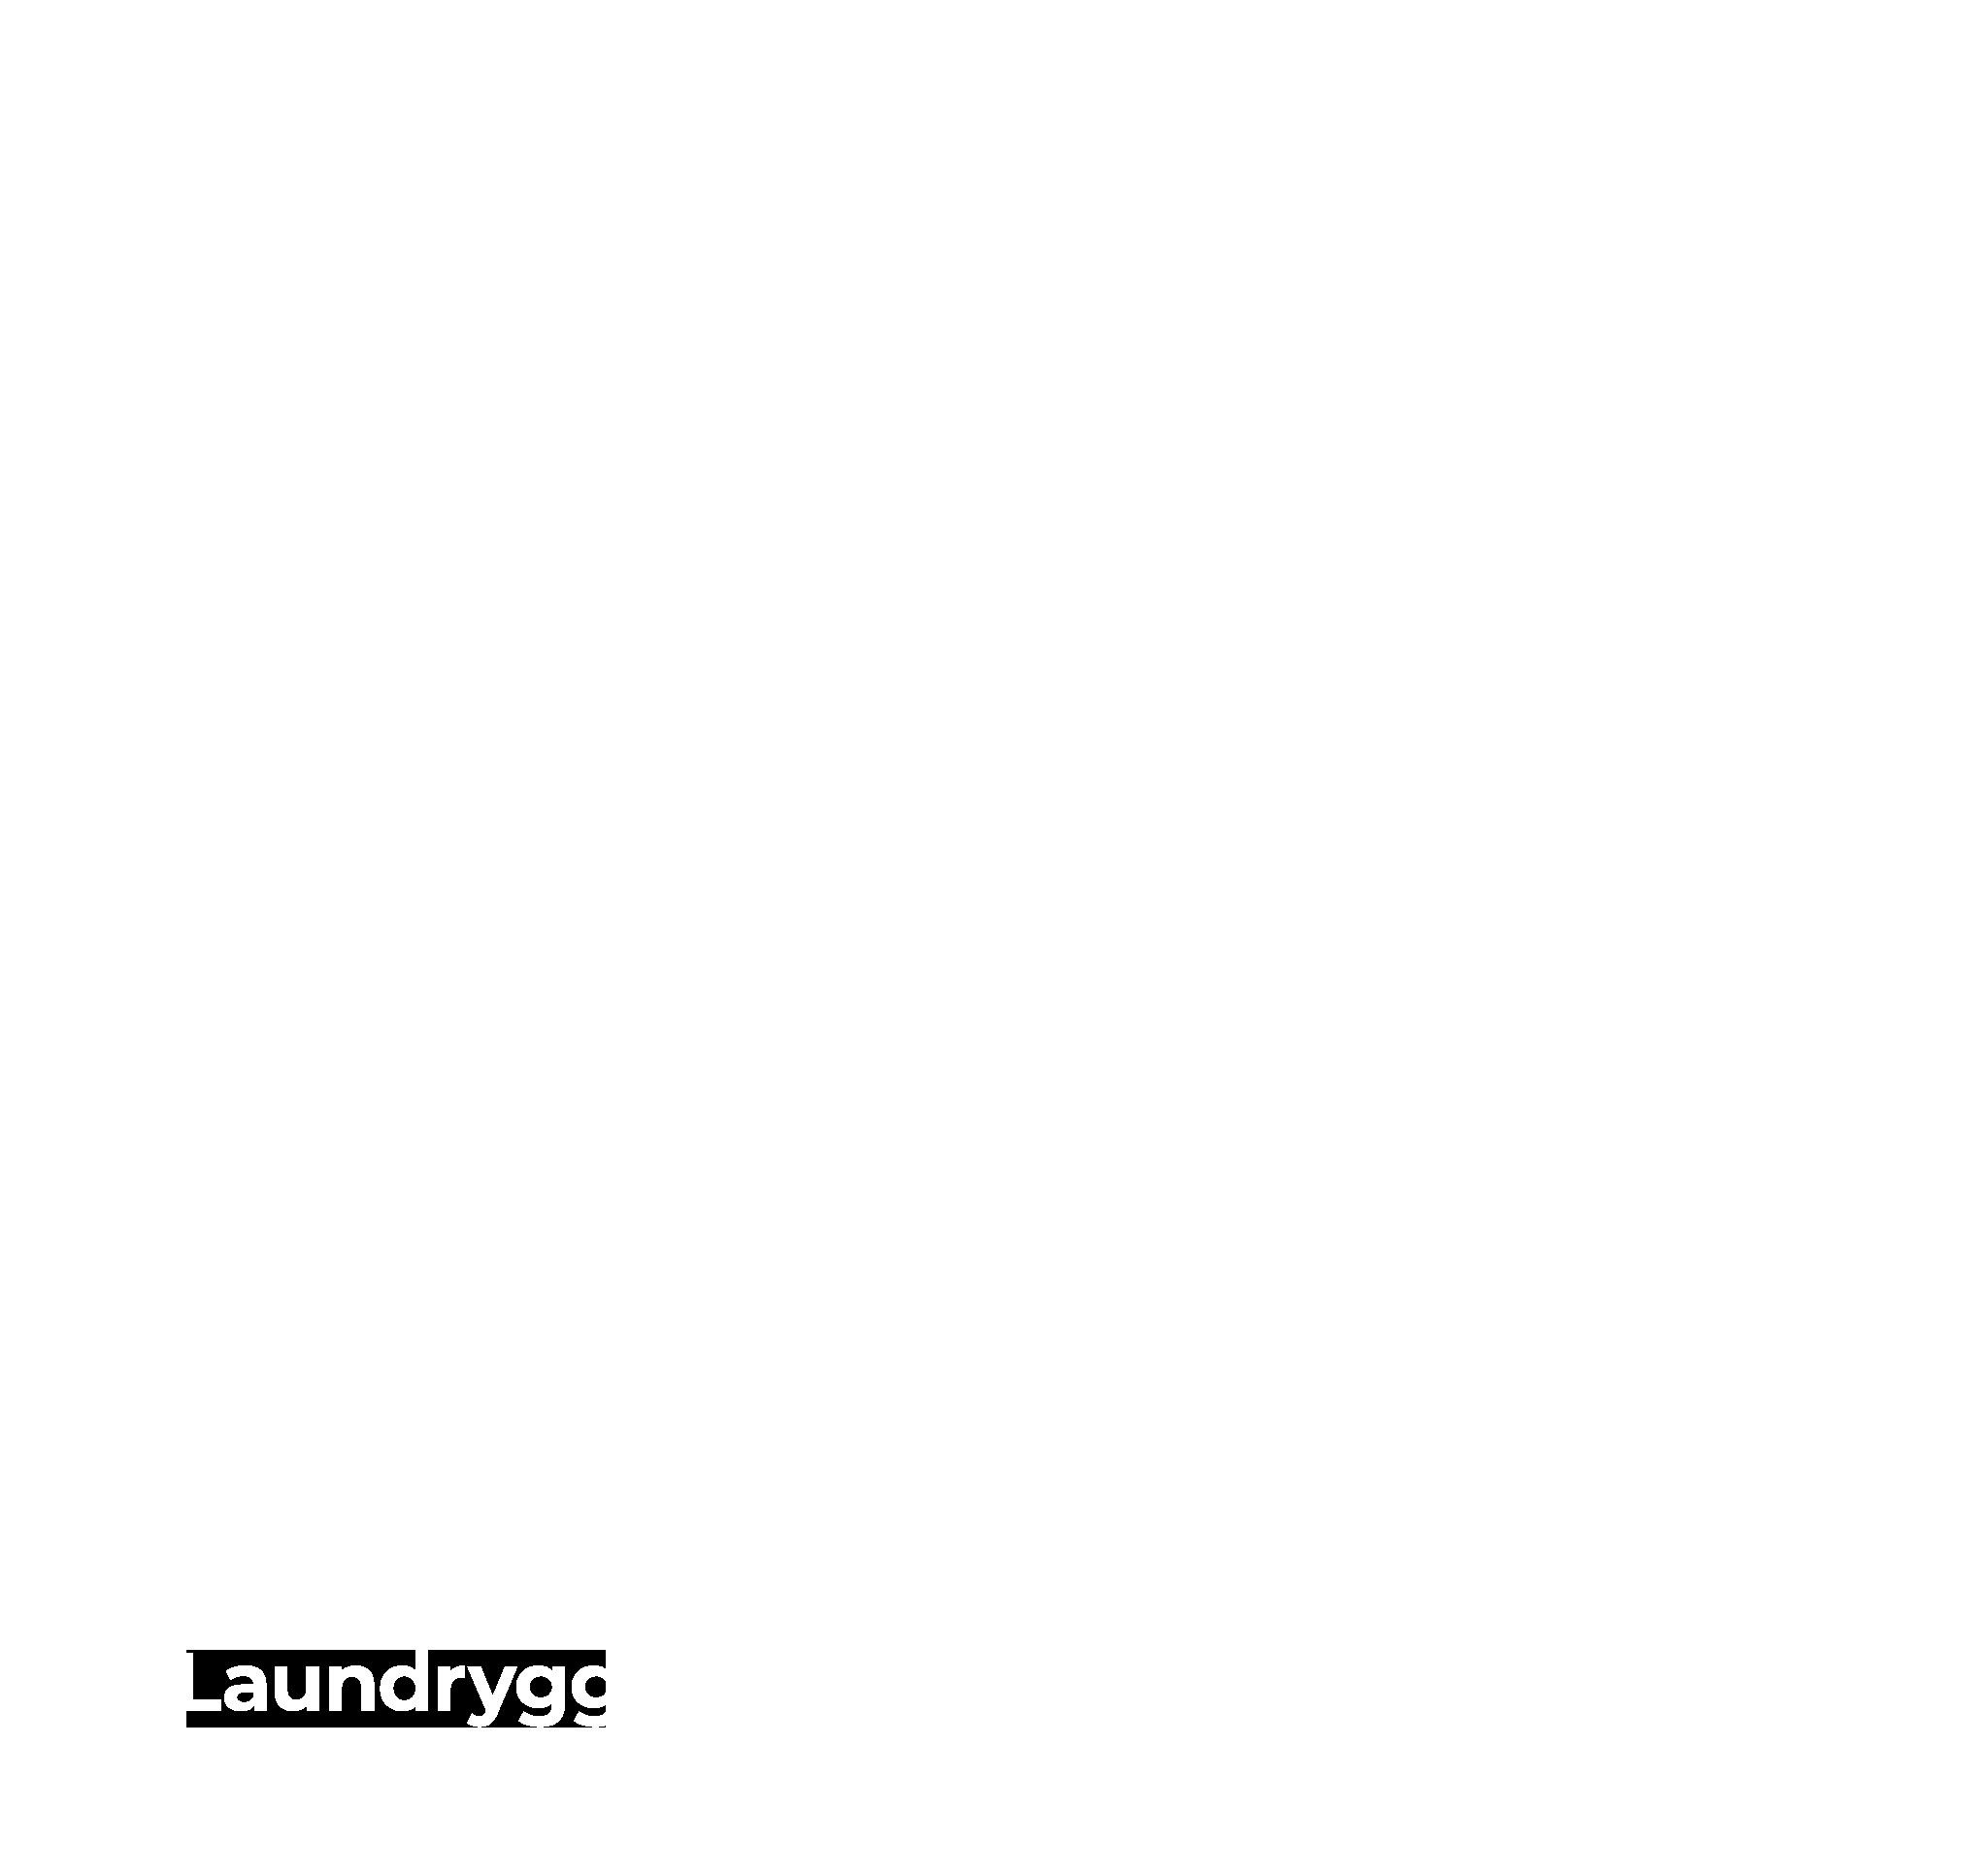 Laundrygg